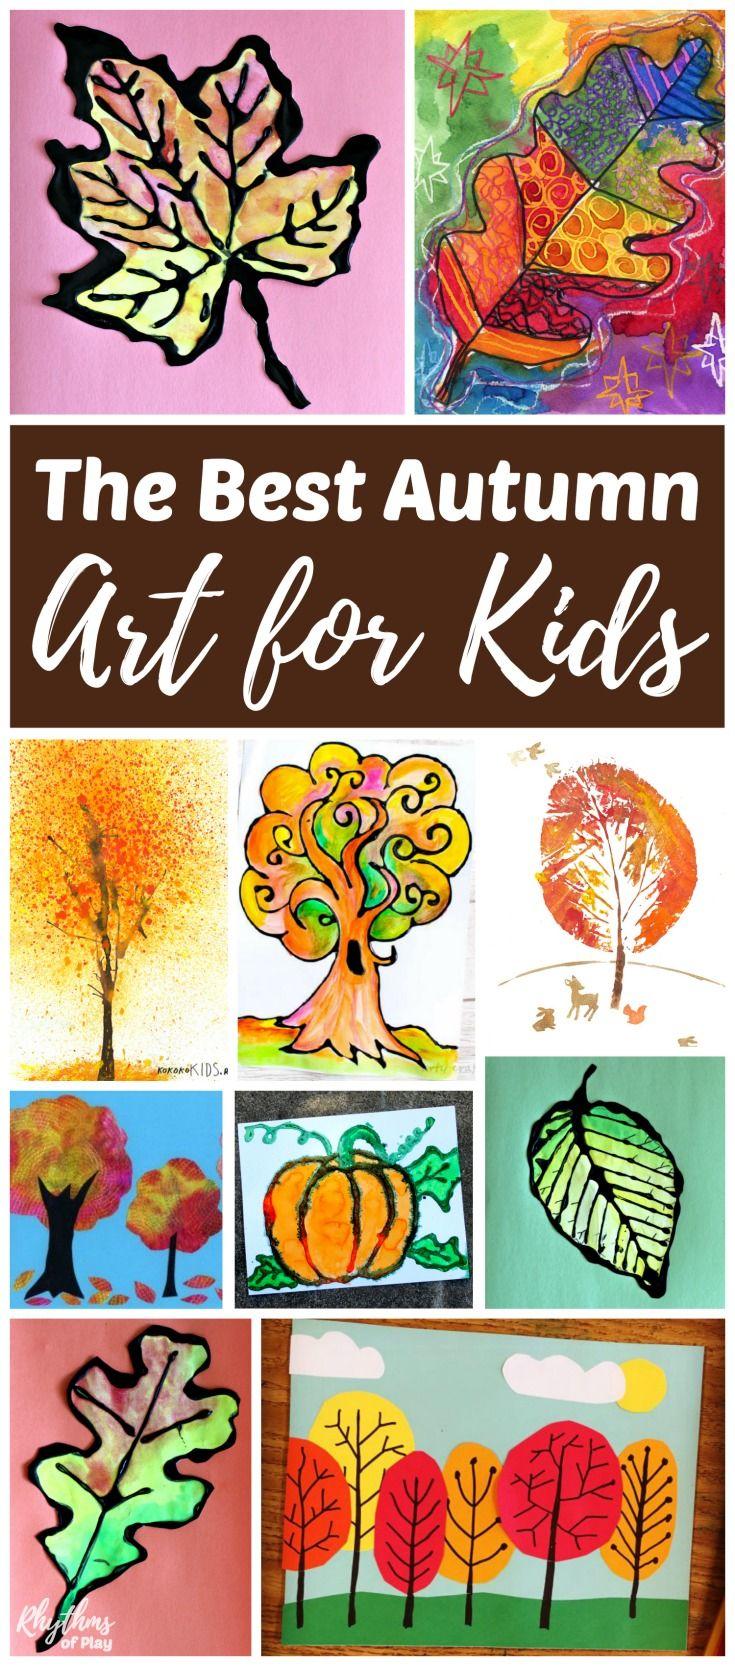 25+ unique Autumn art ideas on Pinterest | Autumn crafts for kids, Fall  crafts for kids and Fall crafts for toddlers